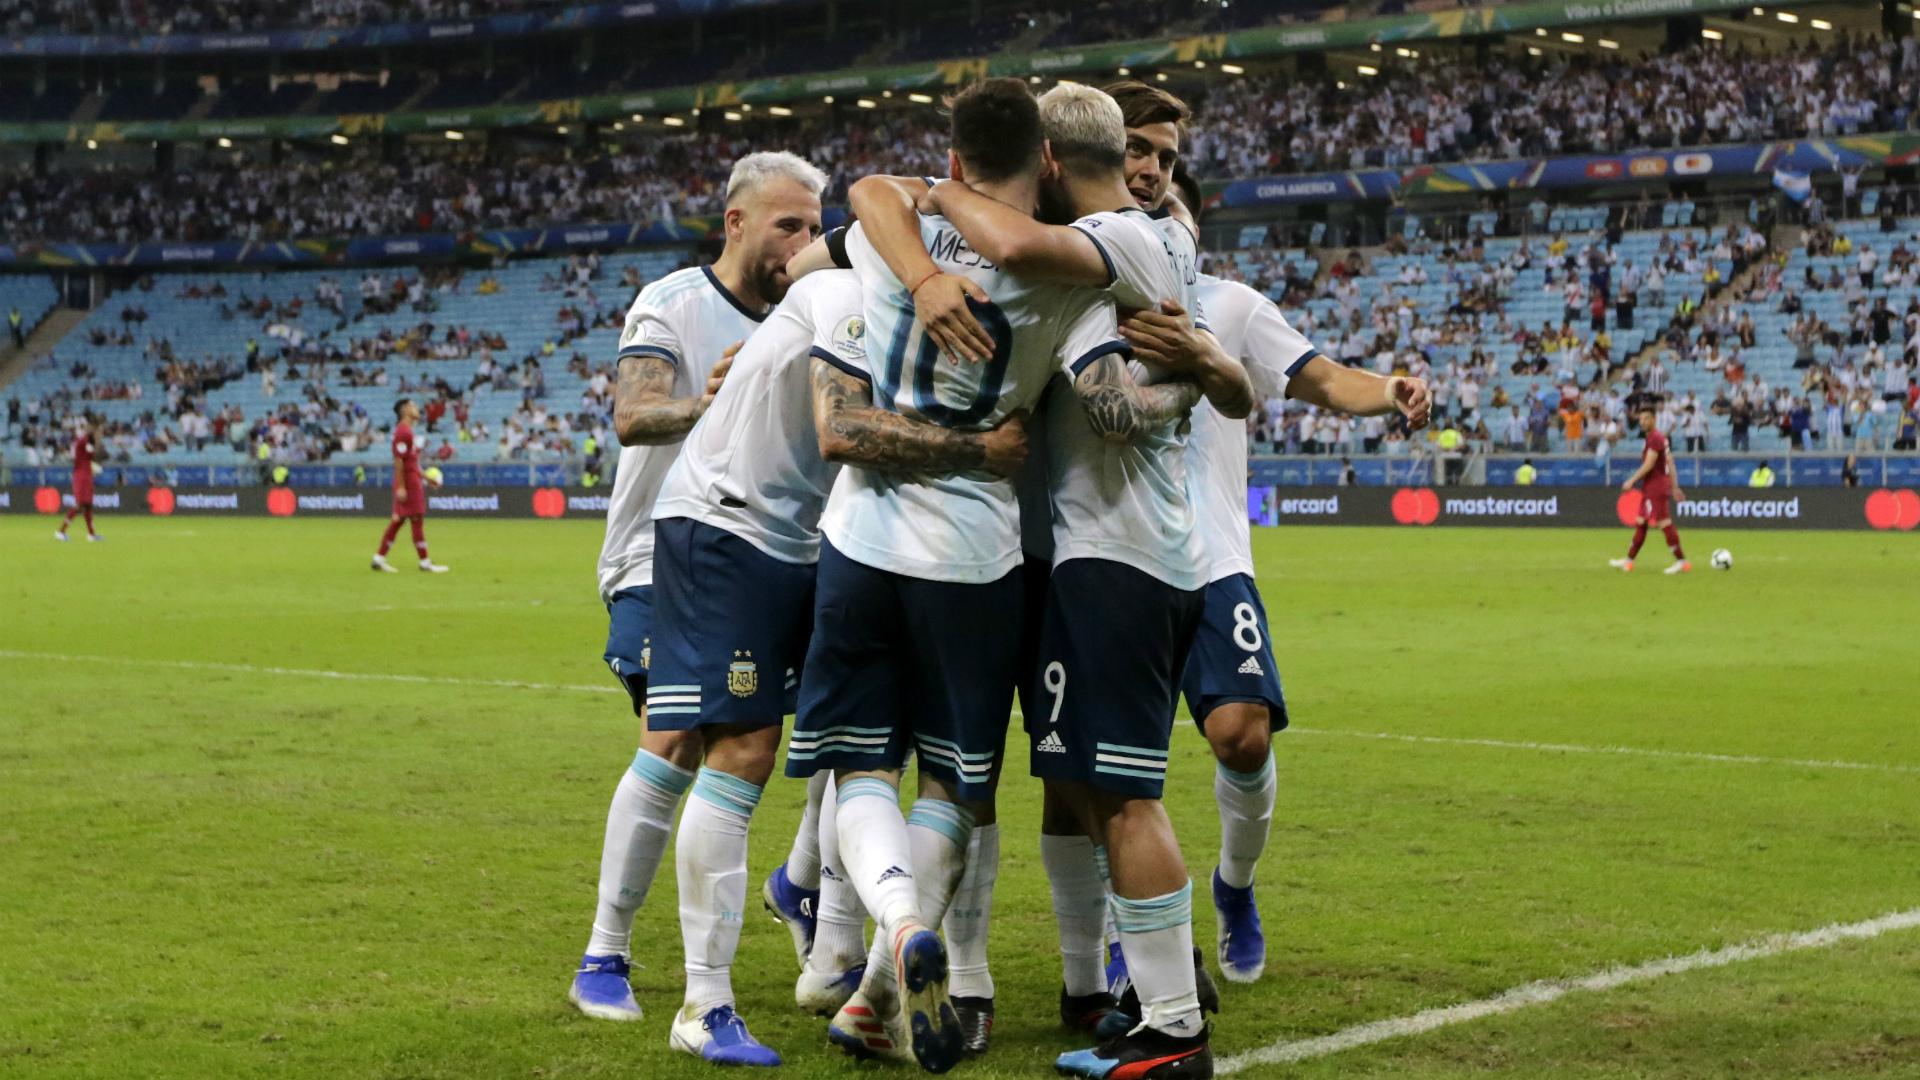 argentina vs uruguay - photo #4